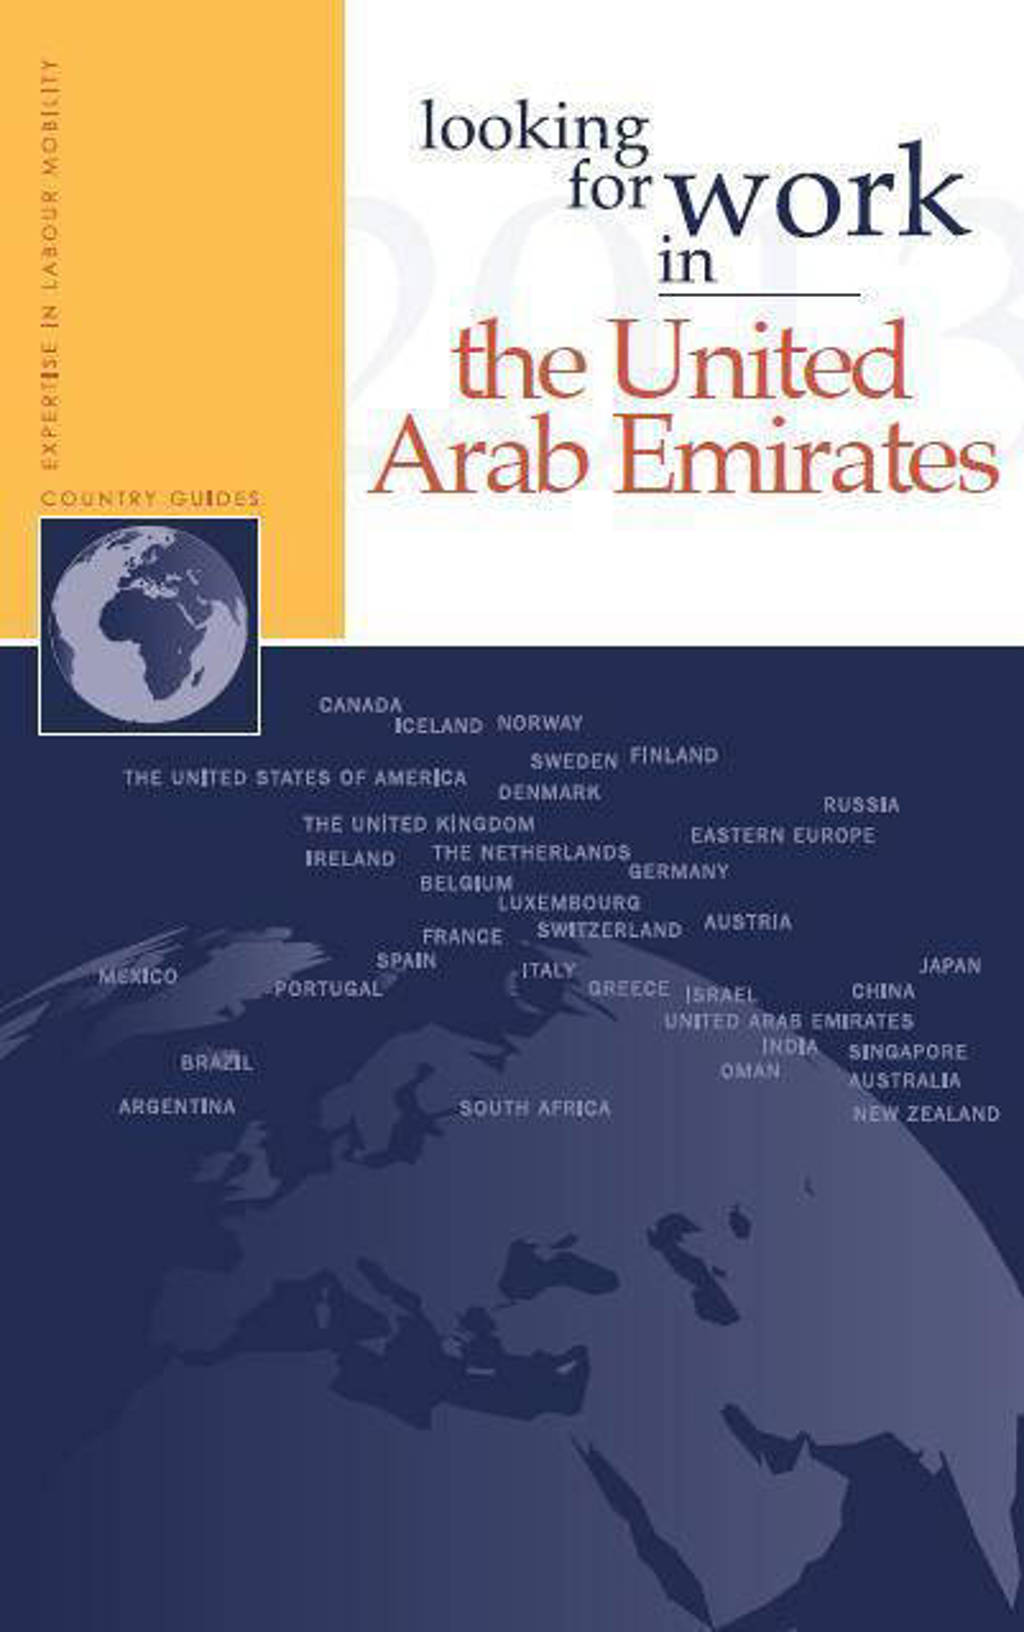 Looking for work in...: Looking for work in United Arab Emirates - A.M. Ripmeester en Willemijn Westerlaken